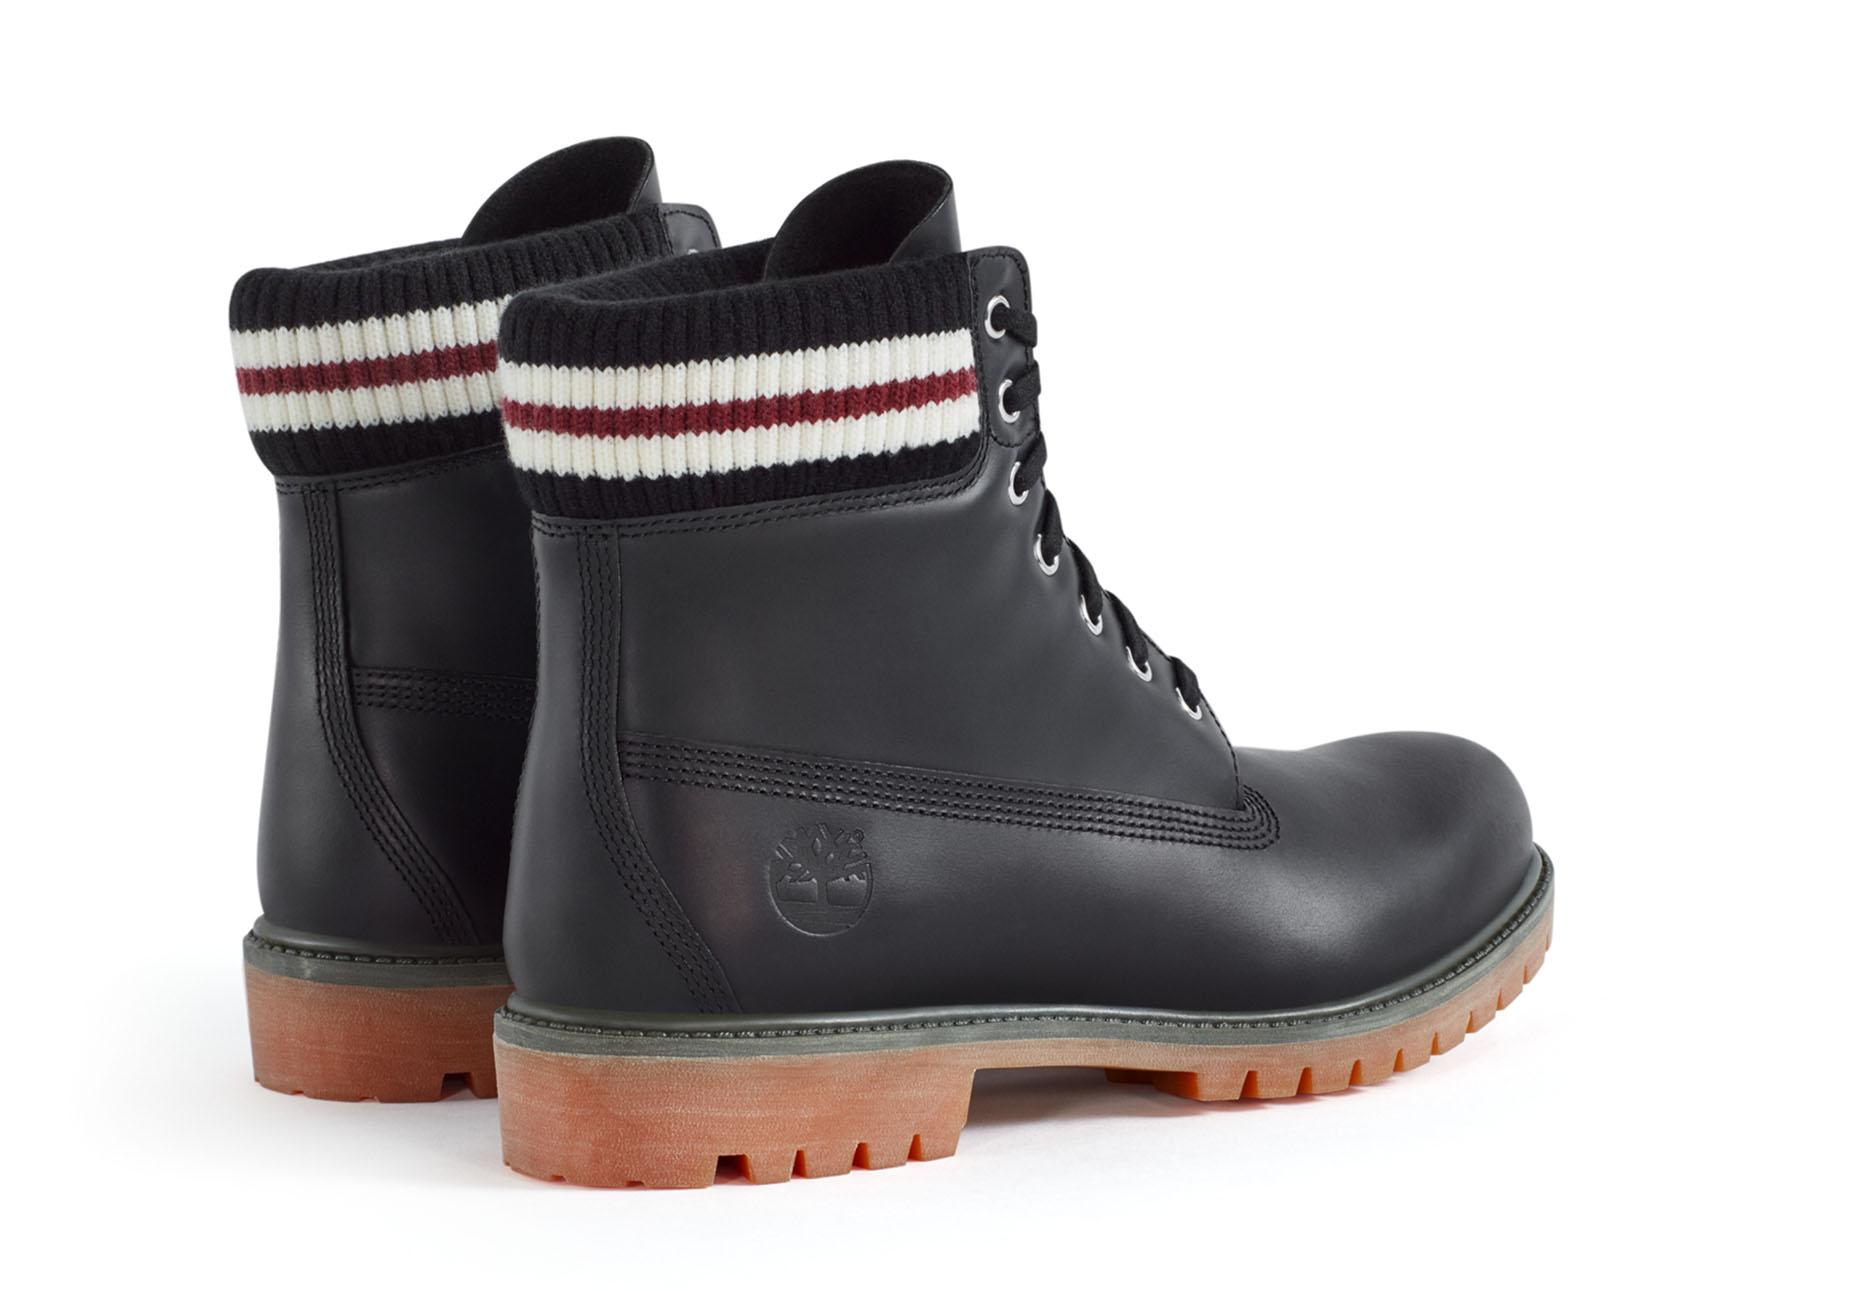 gran descuento de 2019 buen servicio precios de remate MARNI x ZALANDO | Exclusively at Zalando.co.uk | Fashion shoes ...